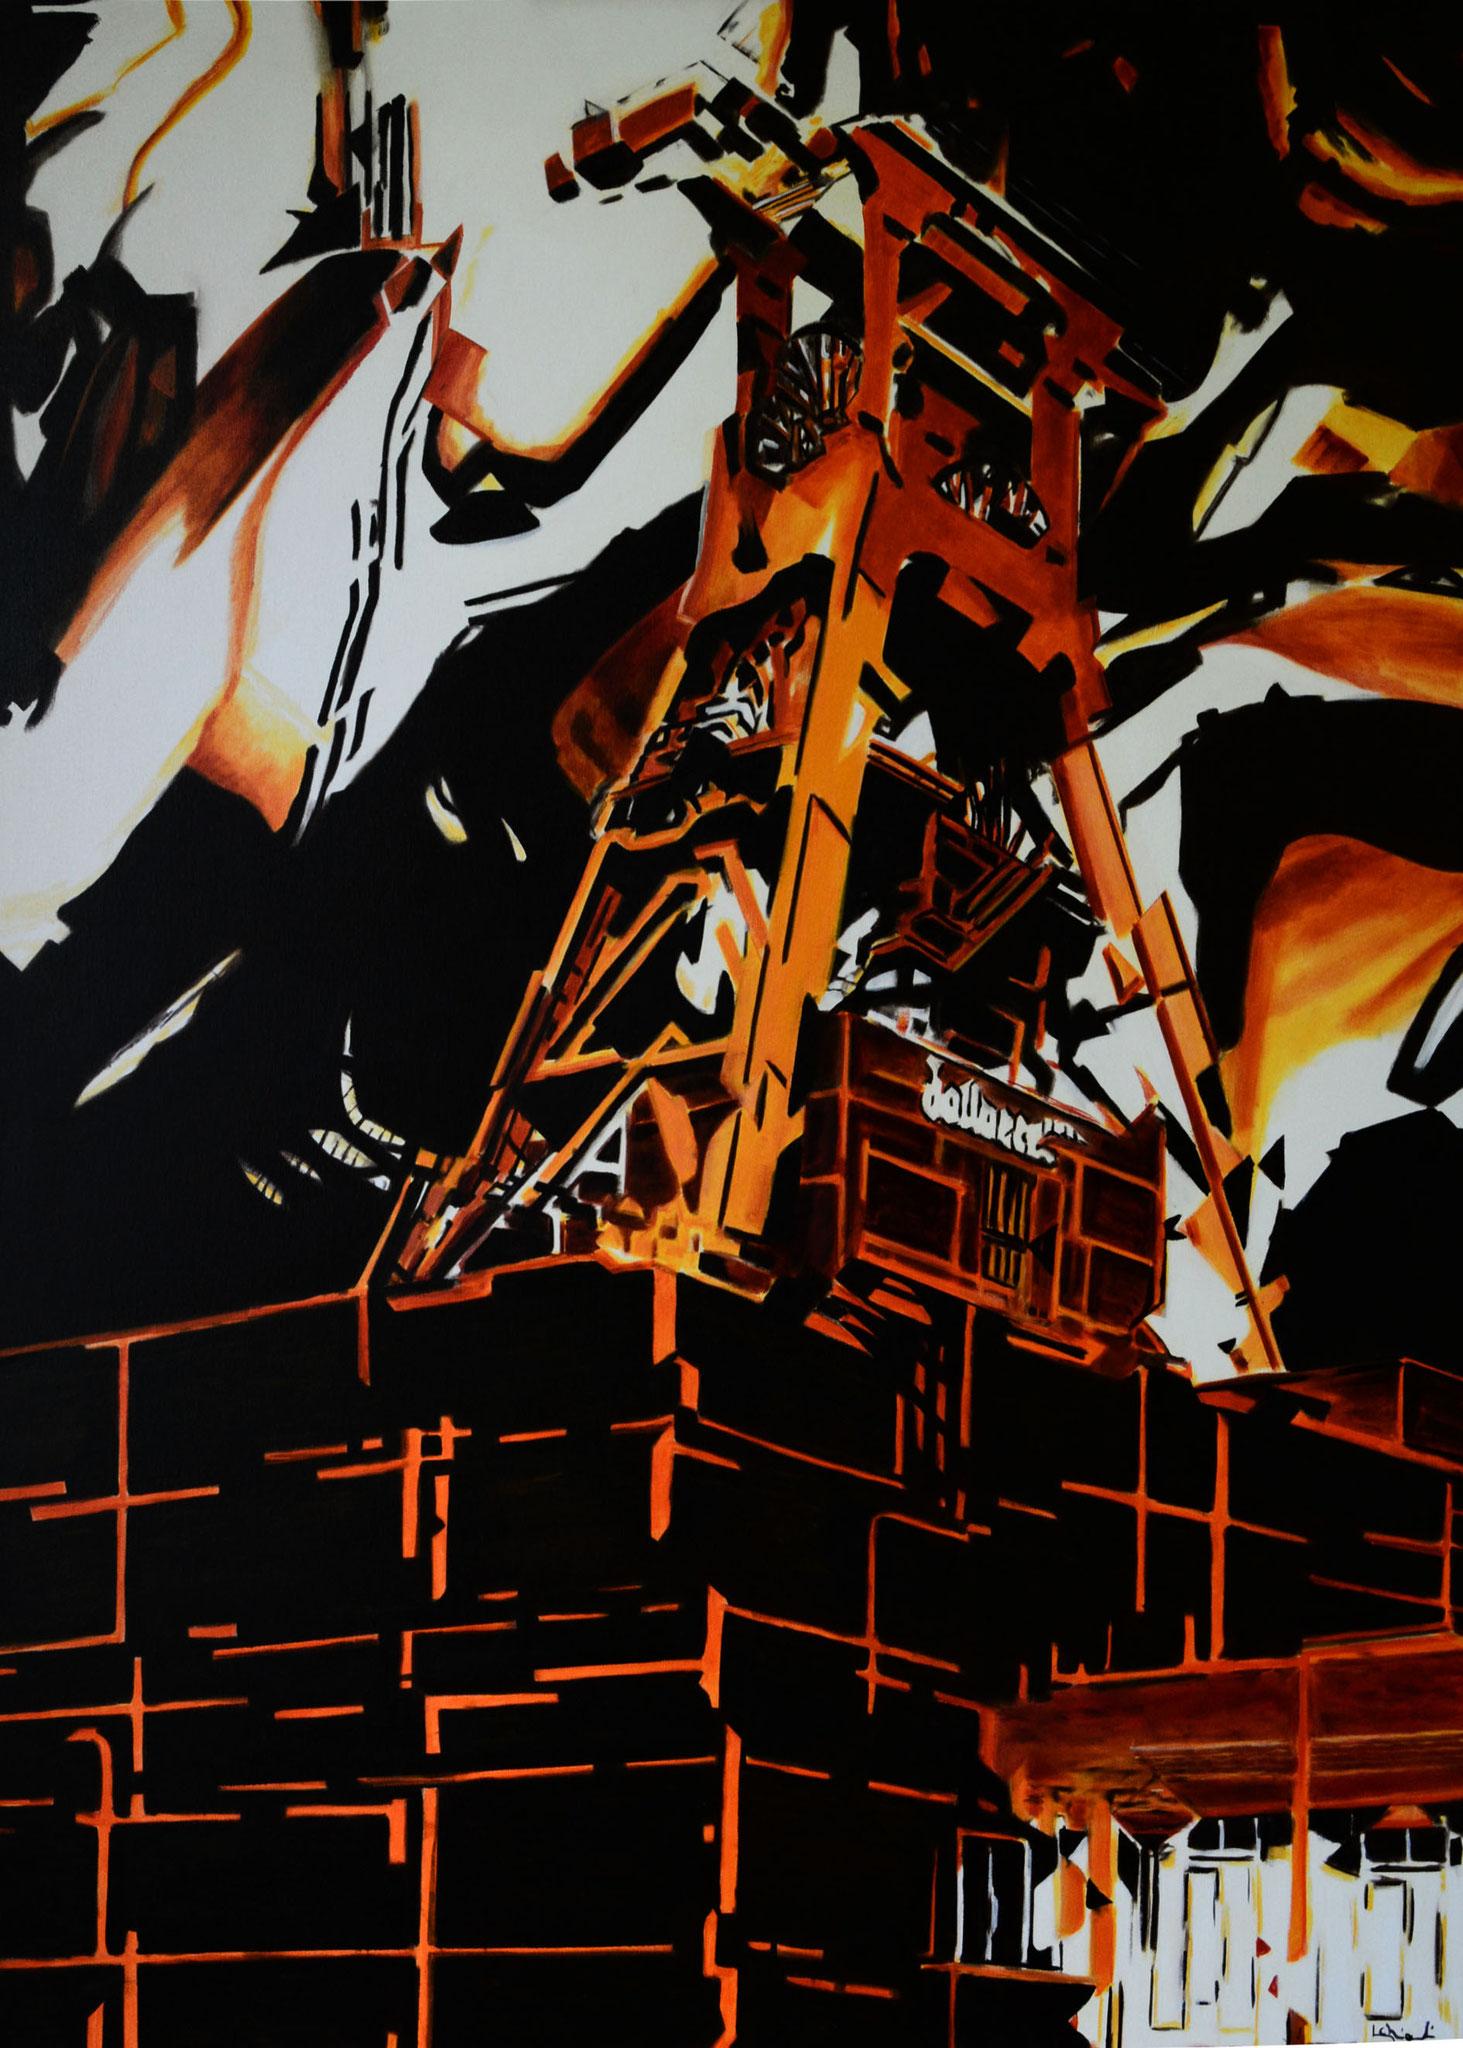 FÖRDERTURM, Öl auf Leinwand, 120 x 100 cm